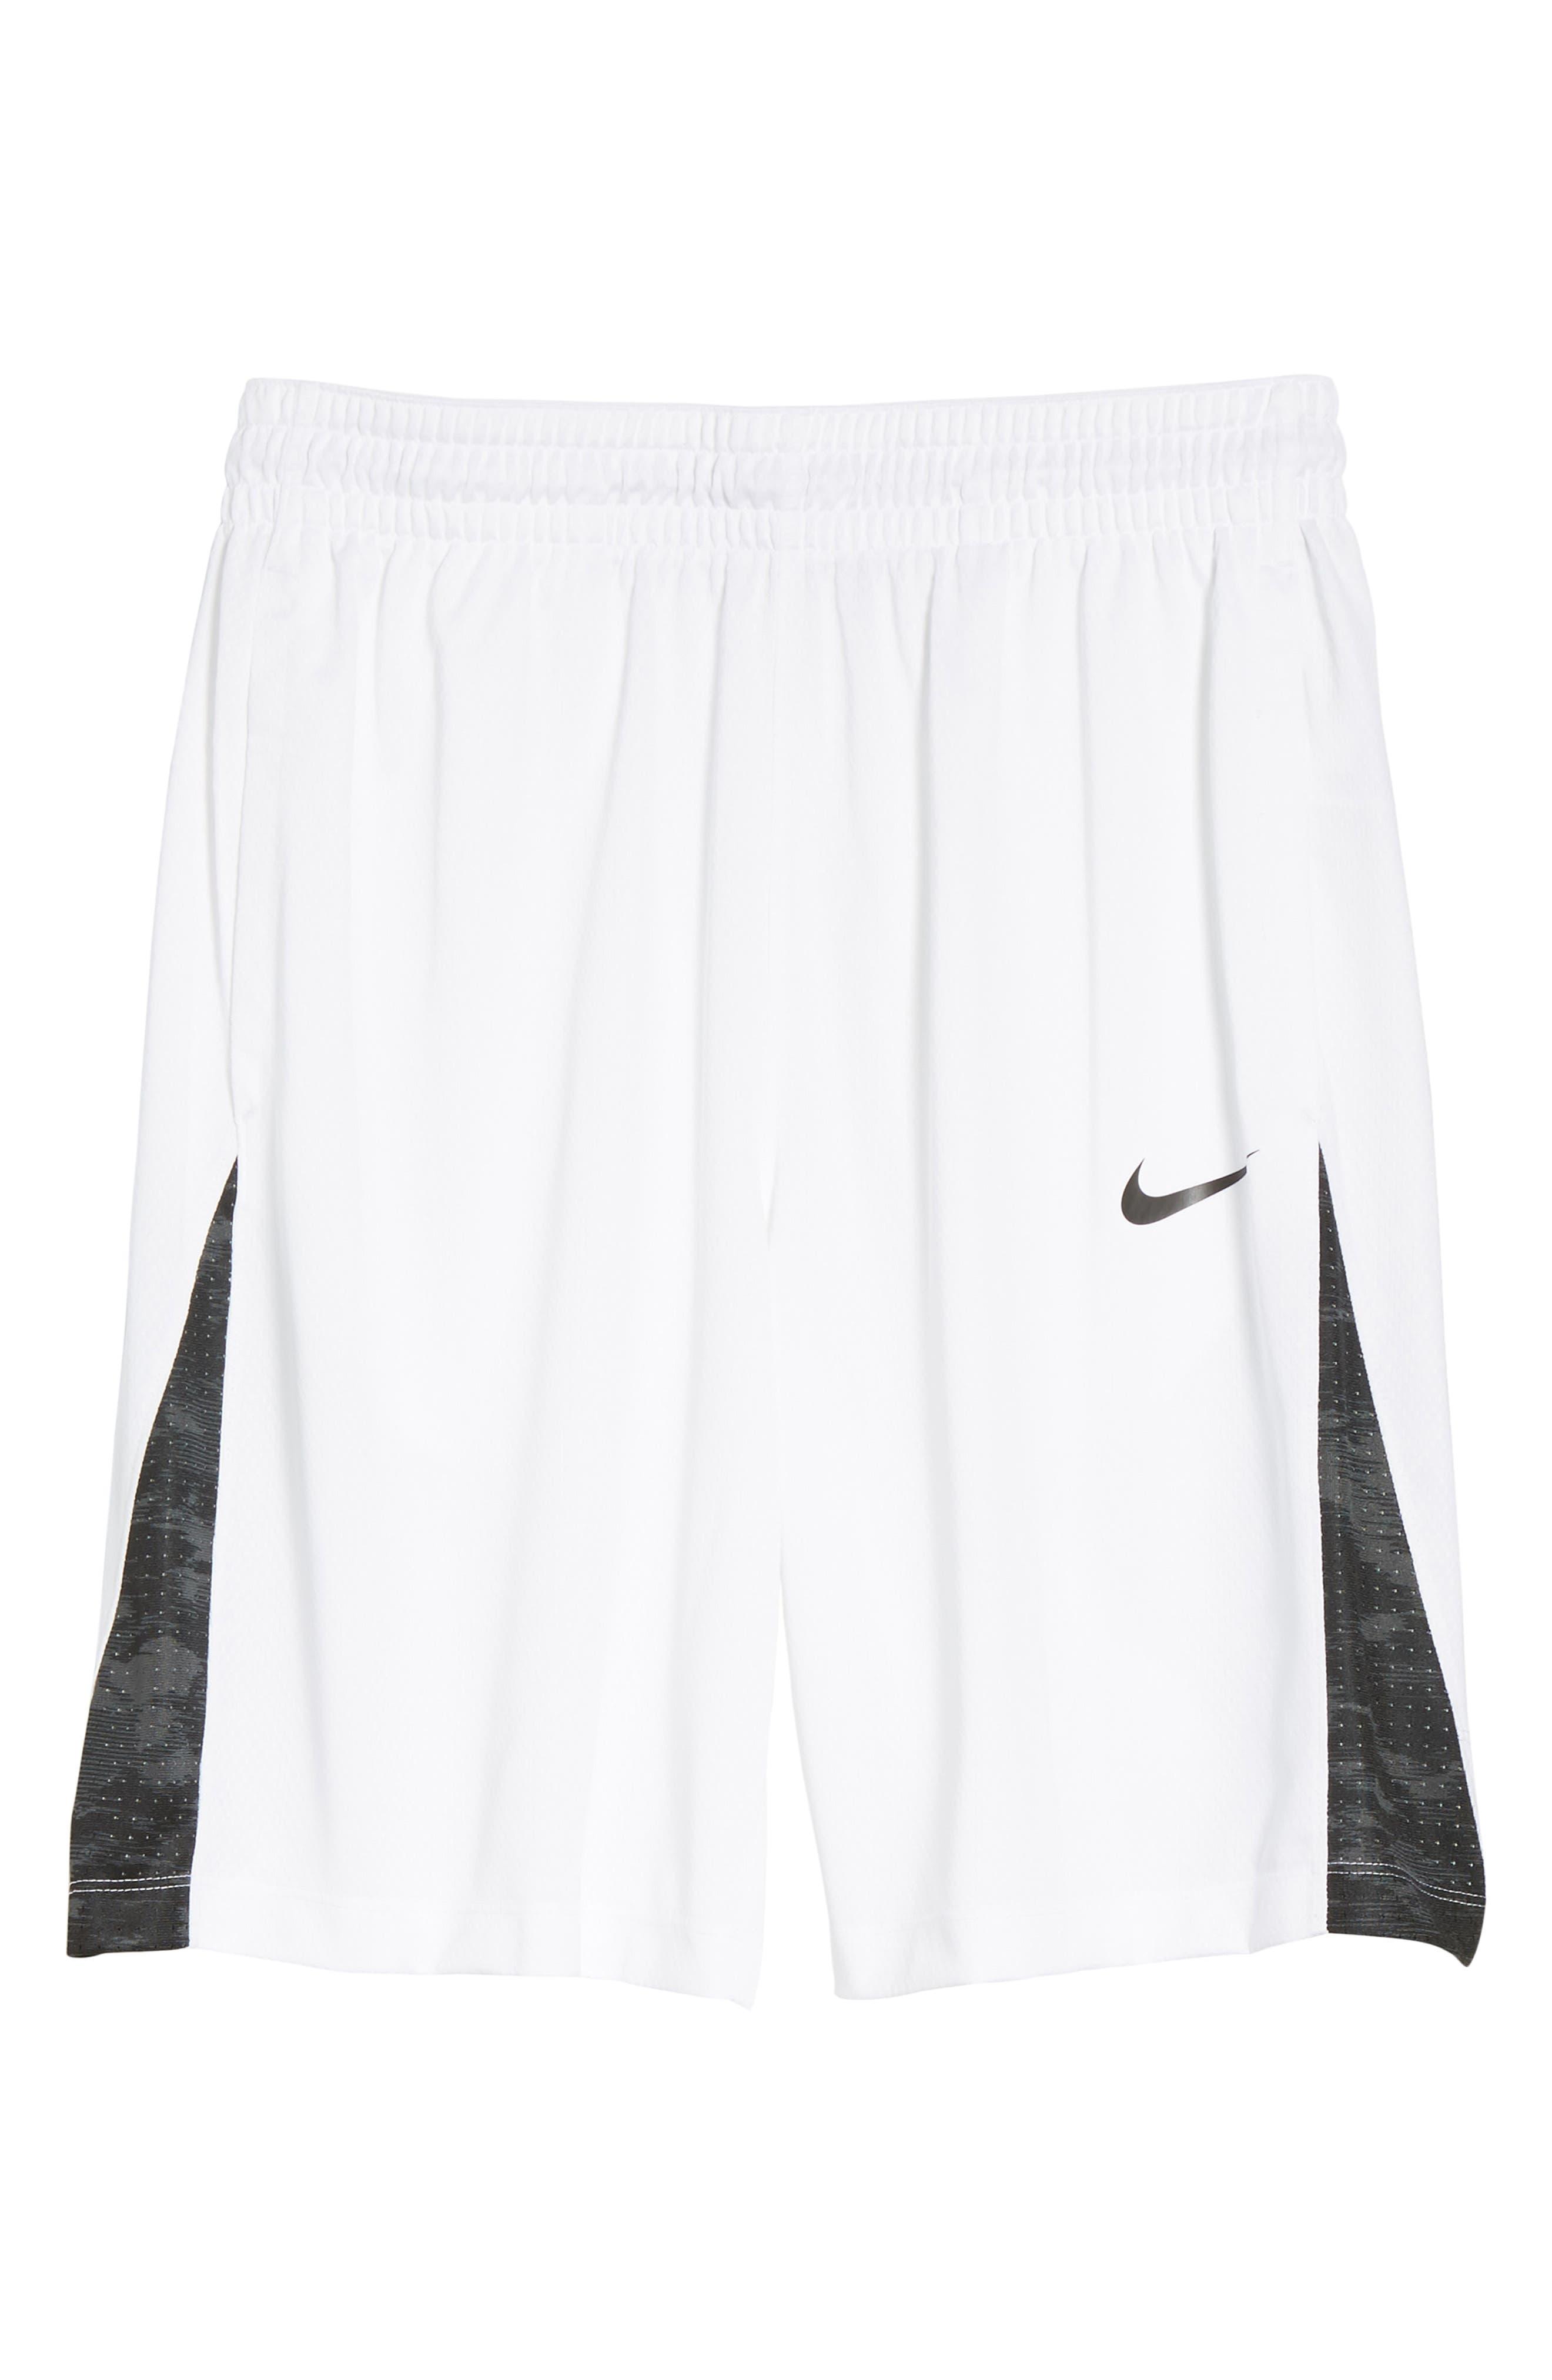 Main Image - Nike Basketball Shorts